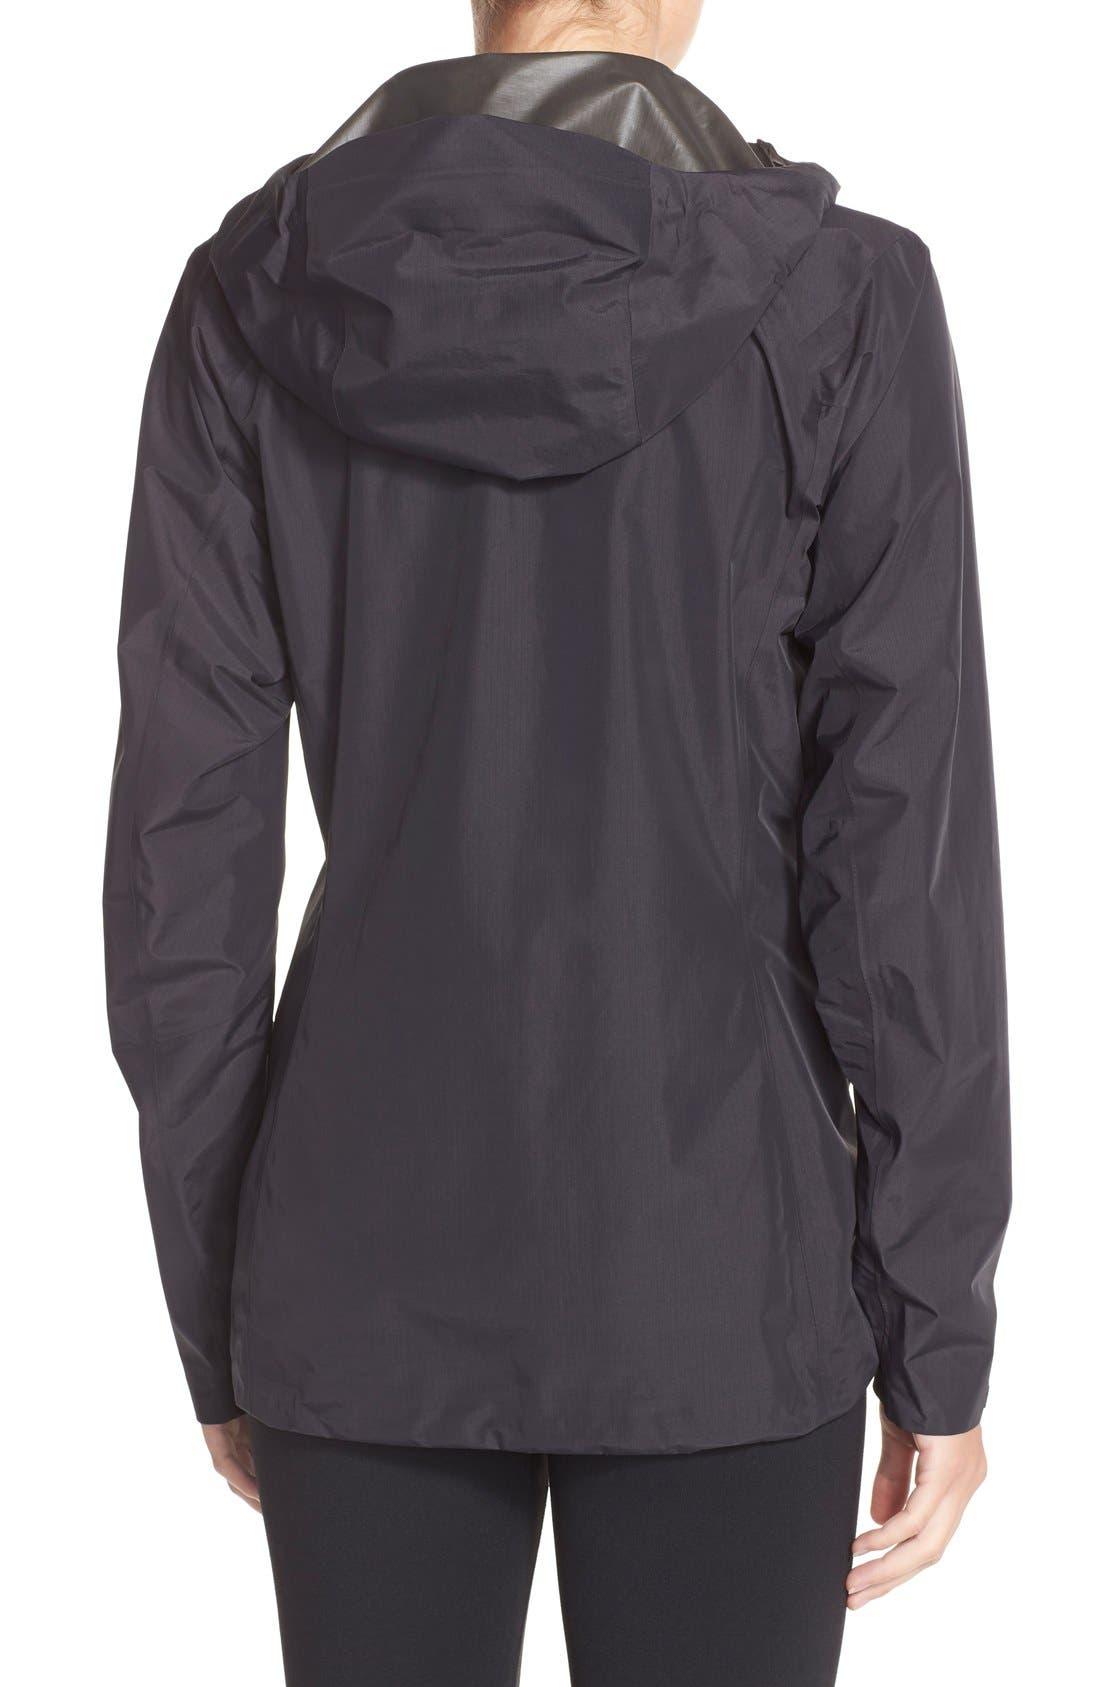 Alternate Image 2  - Arc'teryx 'Beta SL' Waterproof Jacket